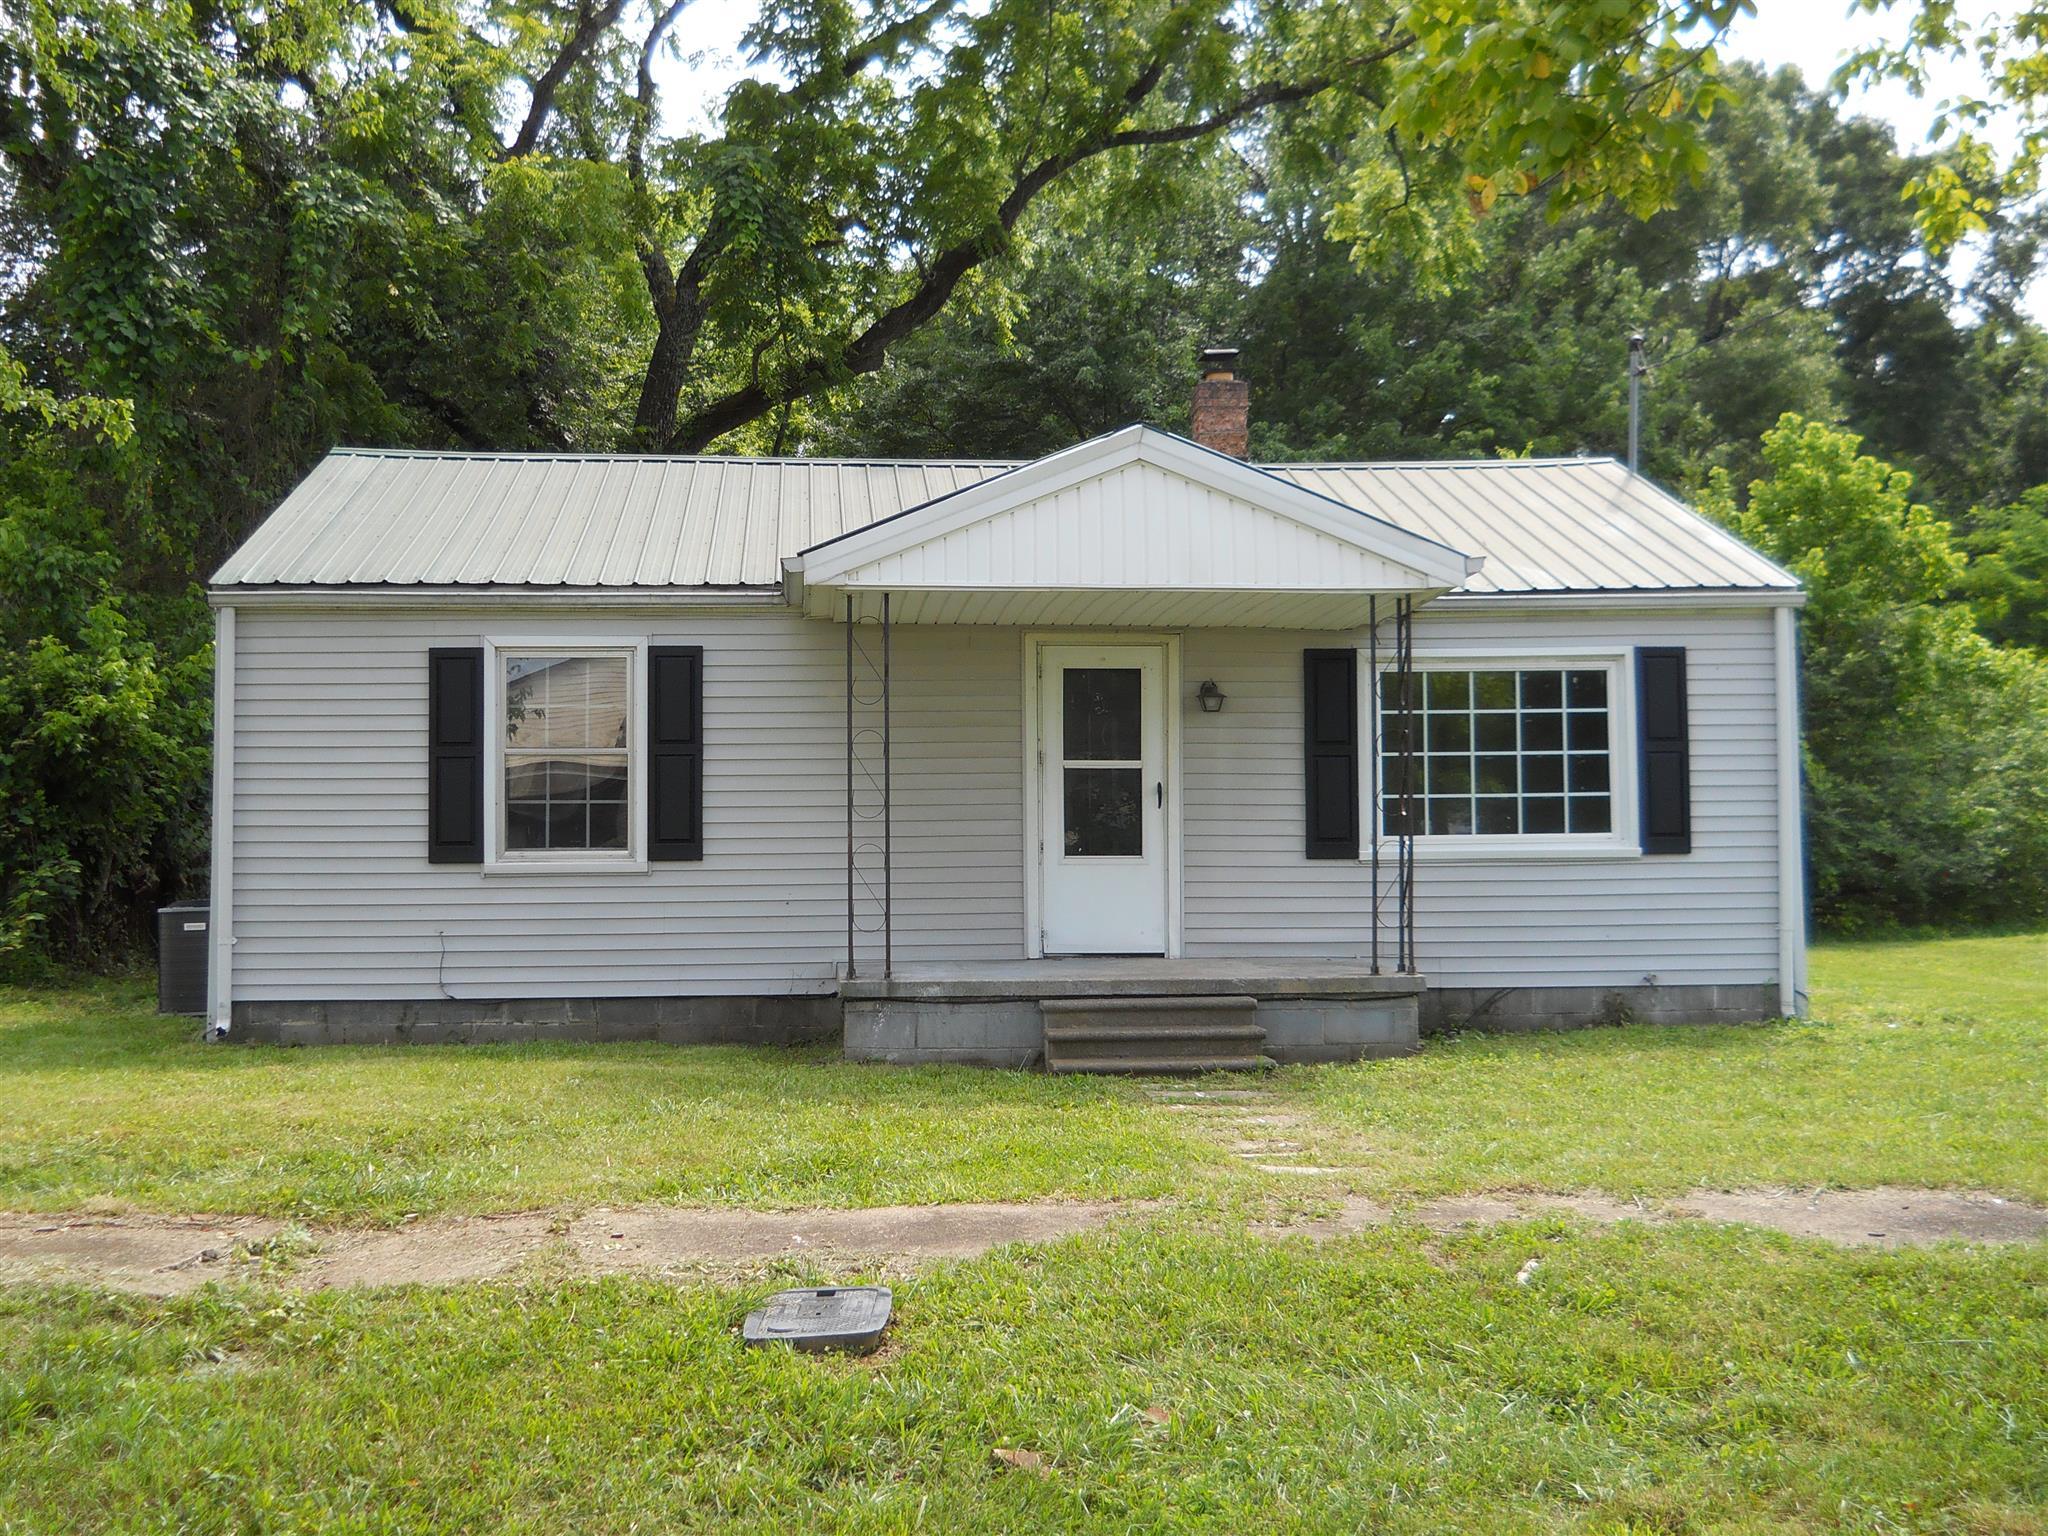 506 S Washington St, Tullahoma, TN 37388 - Tullahoma, TN real estate listing